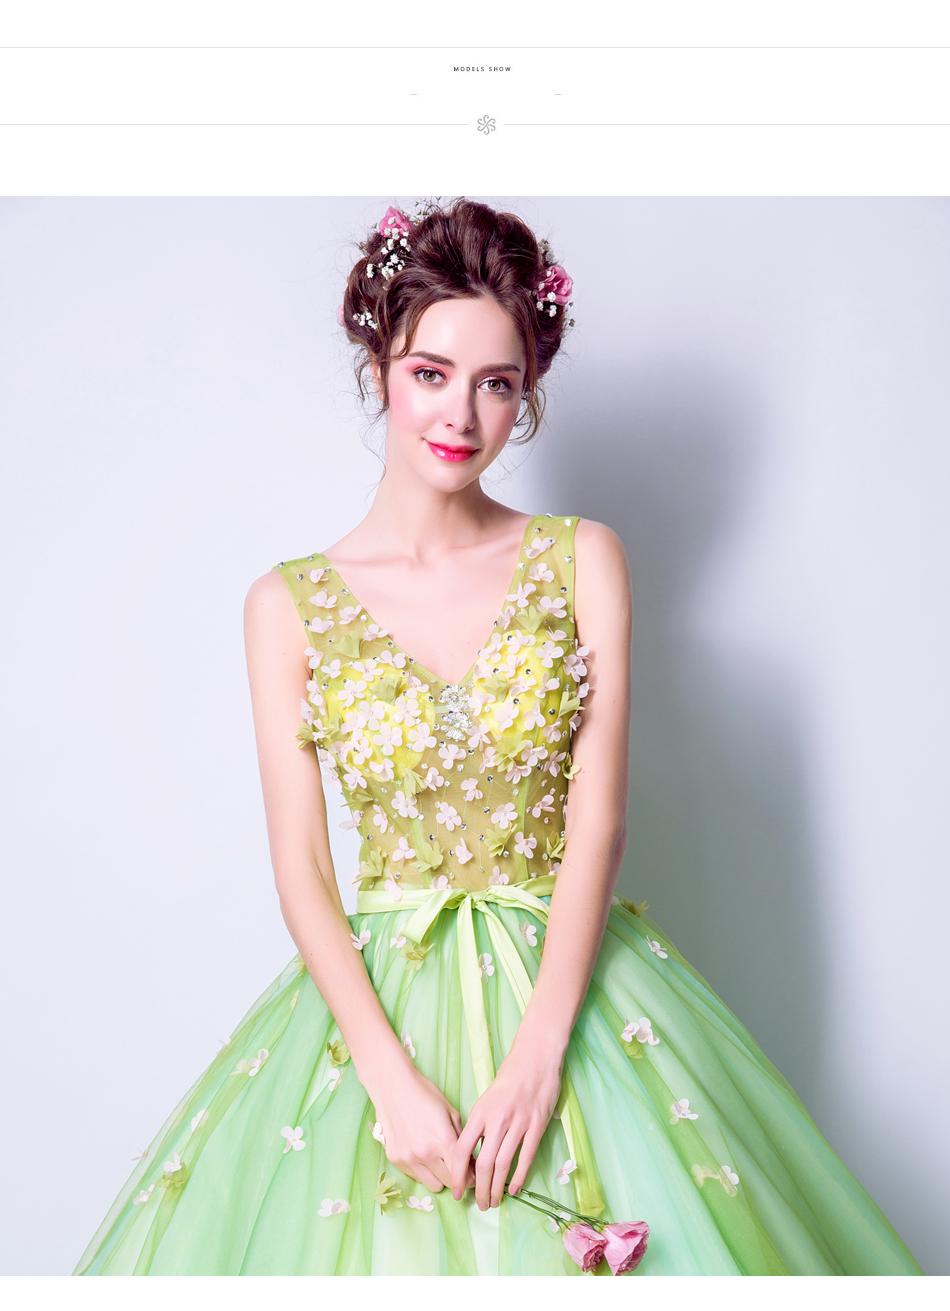 Angel Wedding Dress Marriage Bride Bridal Gown Vestido De Noiva 2017Soft powder, Qingjian Lvxian beauty, petals, green 9718 9